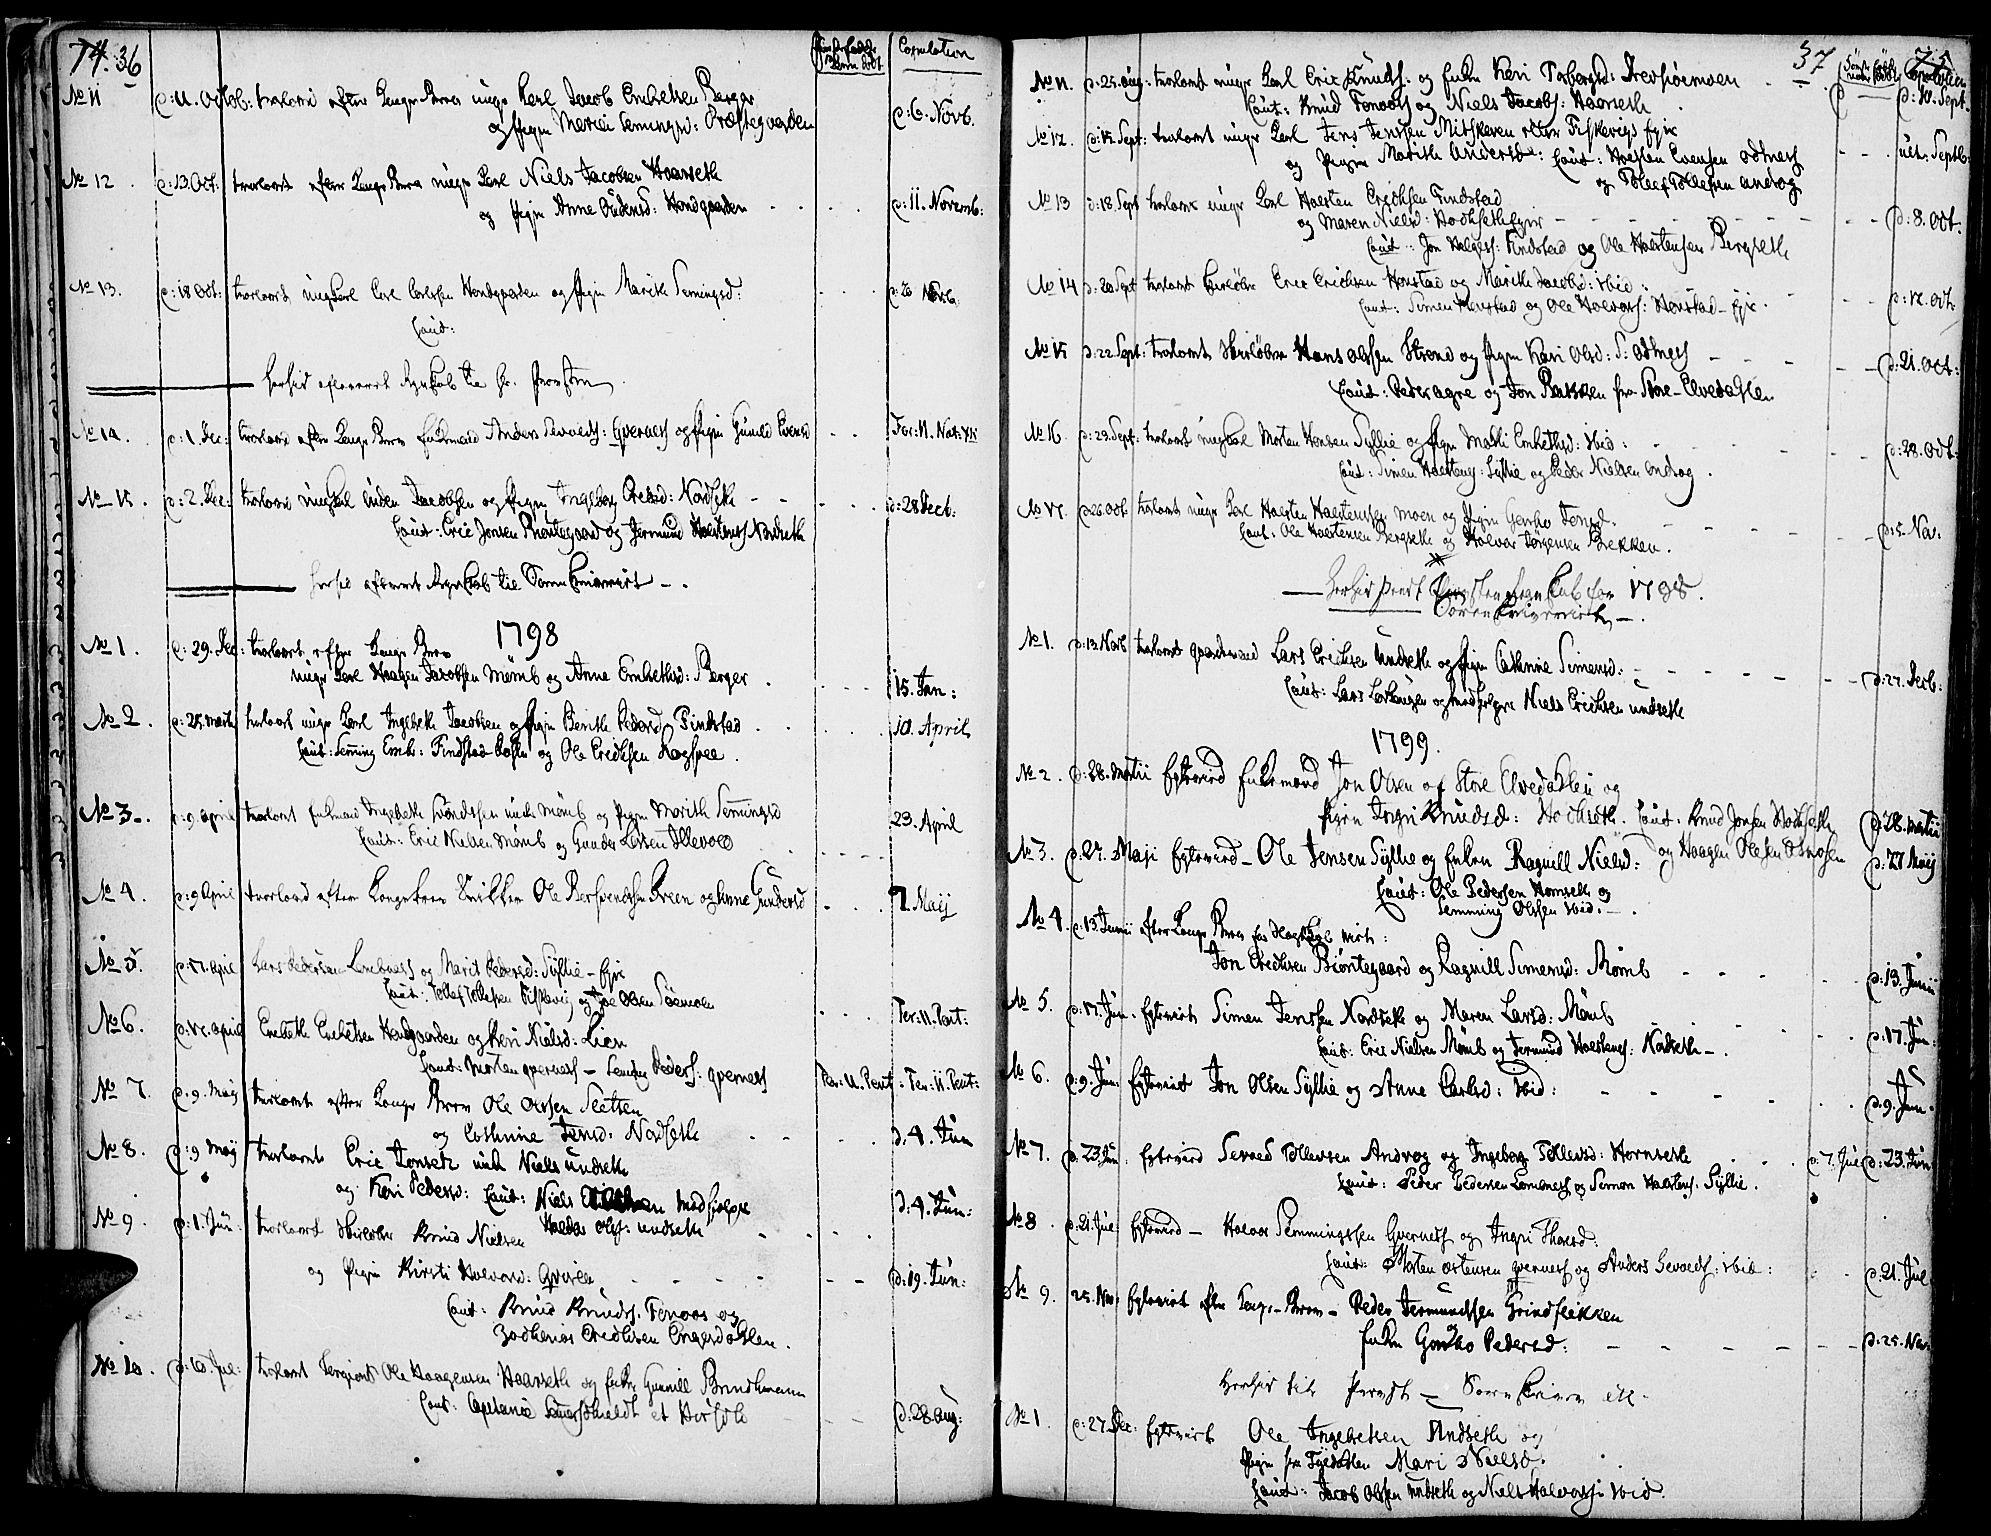 SAH, Rendalen prestekontor, H/Ha/Haa/L0002: Ministerialbok nr. 2, 1788-1814, s. 36-37